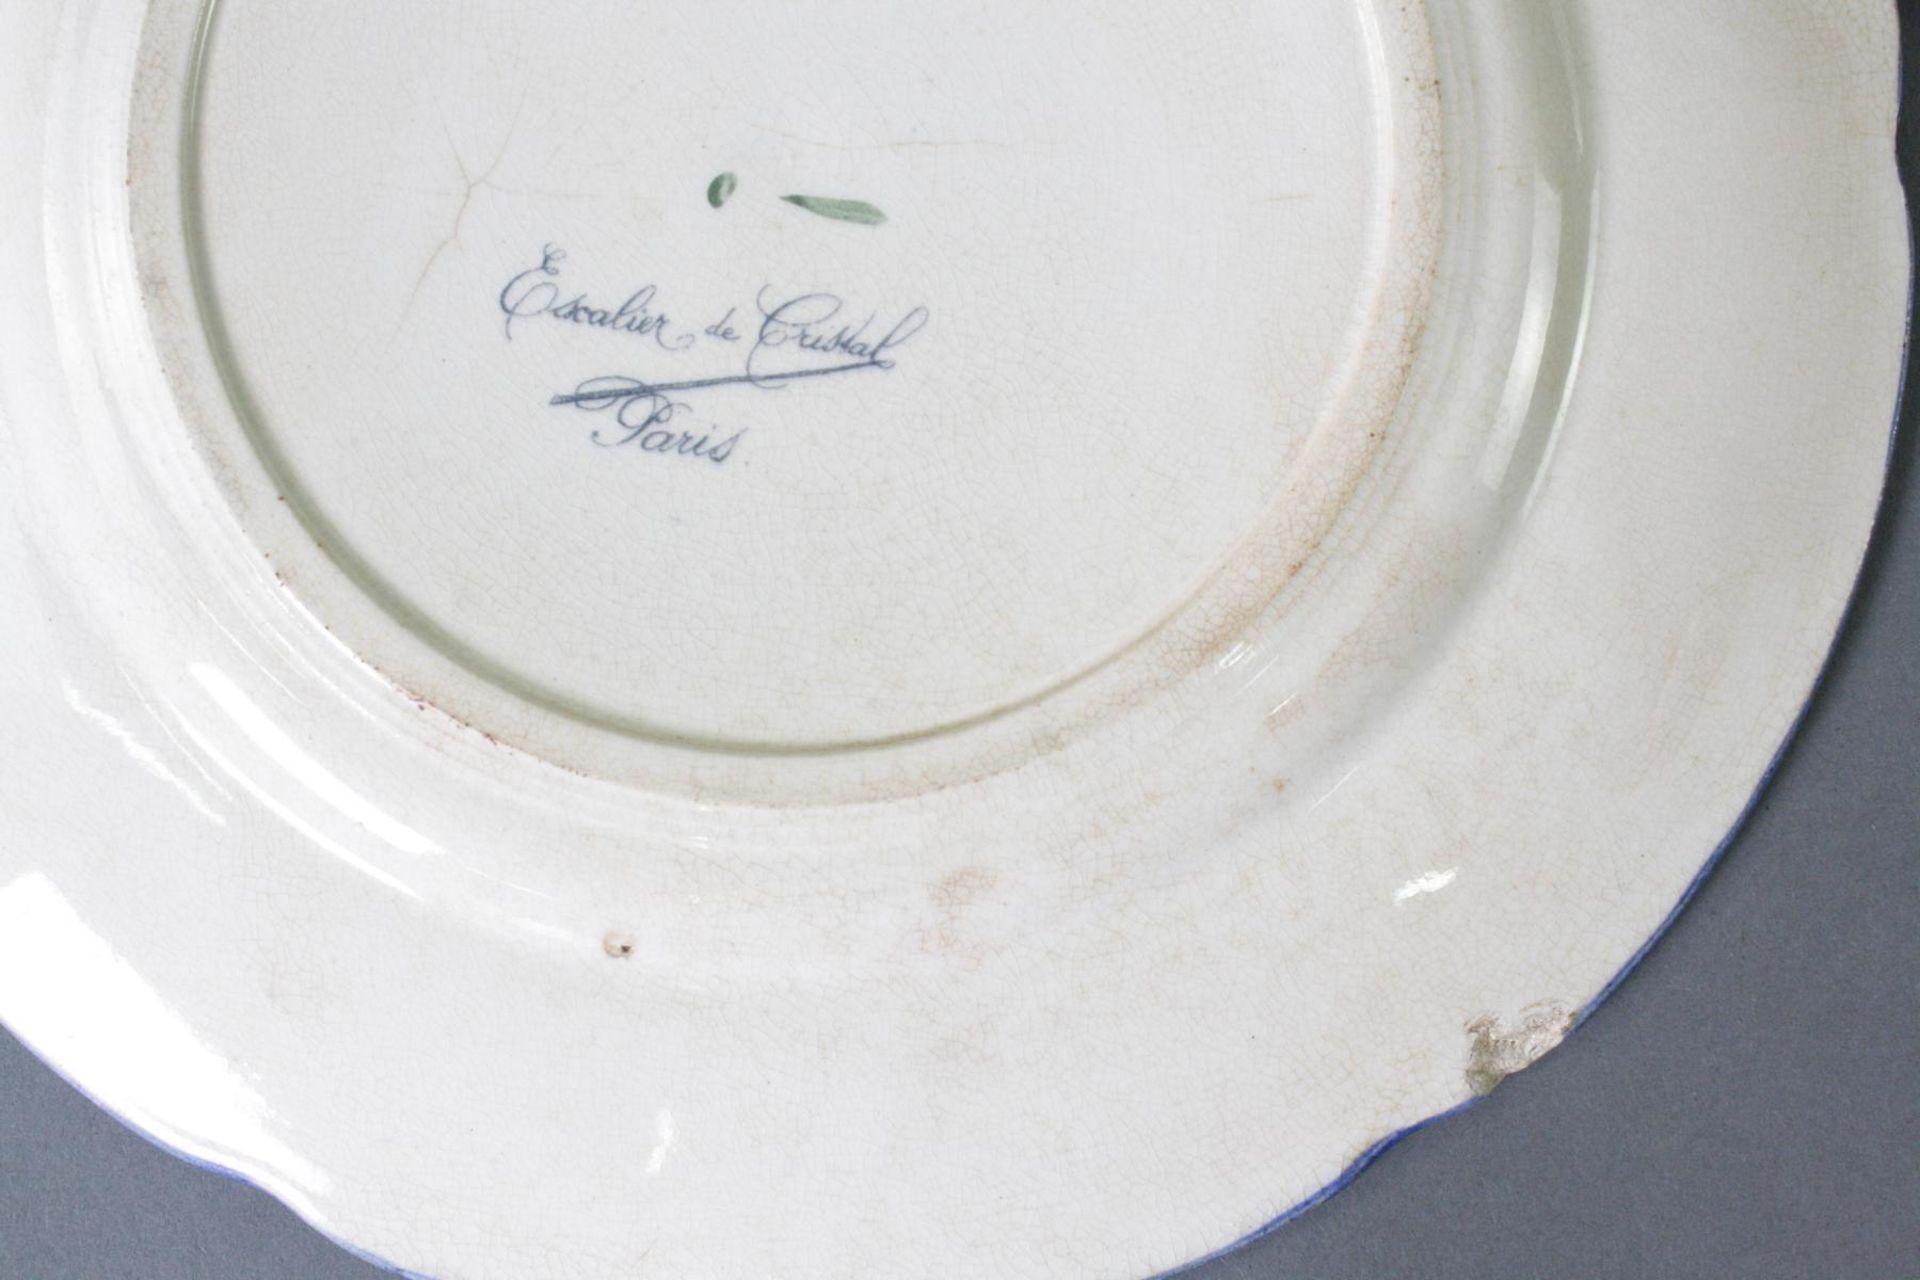 5 Keramikteller, Escalier de Cristal Paris - Bild 3 aus 4